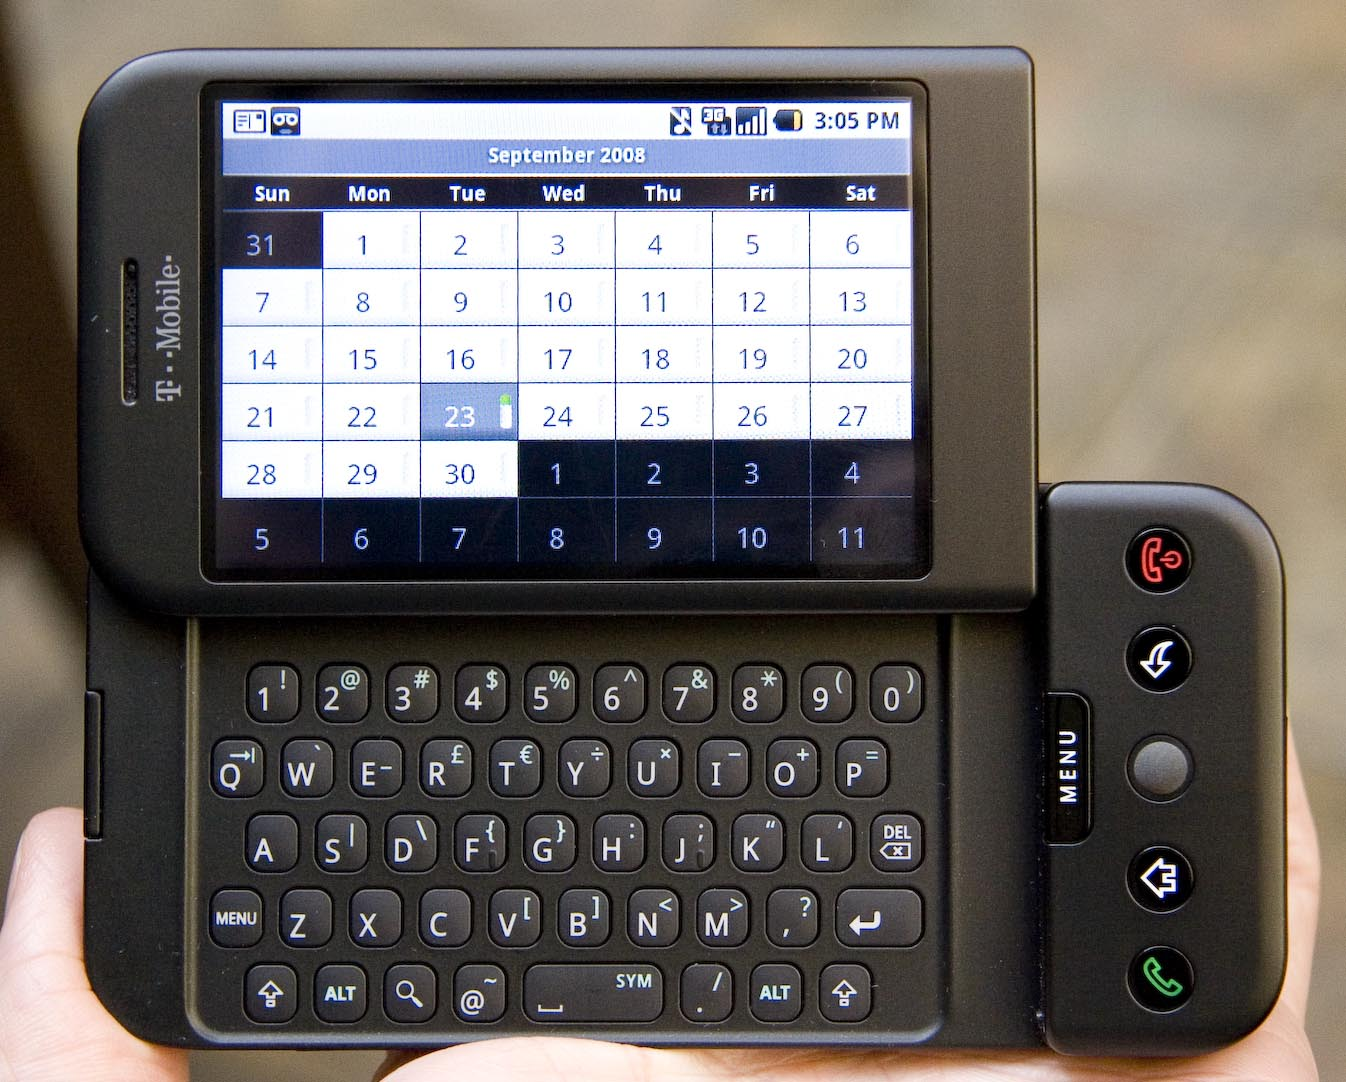 Obrázek: Jak vypadal první smartphone s Androidem? T-Mobile G1 slaví deset let